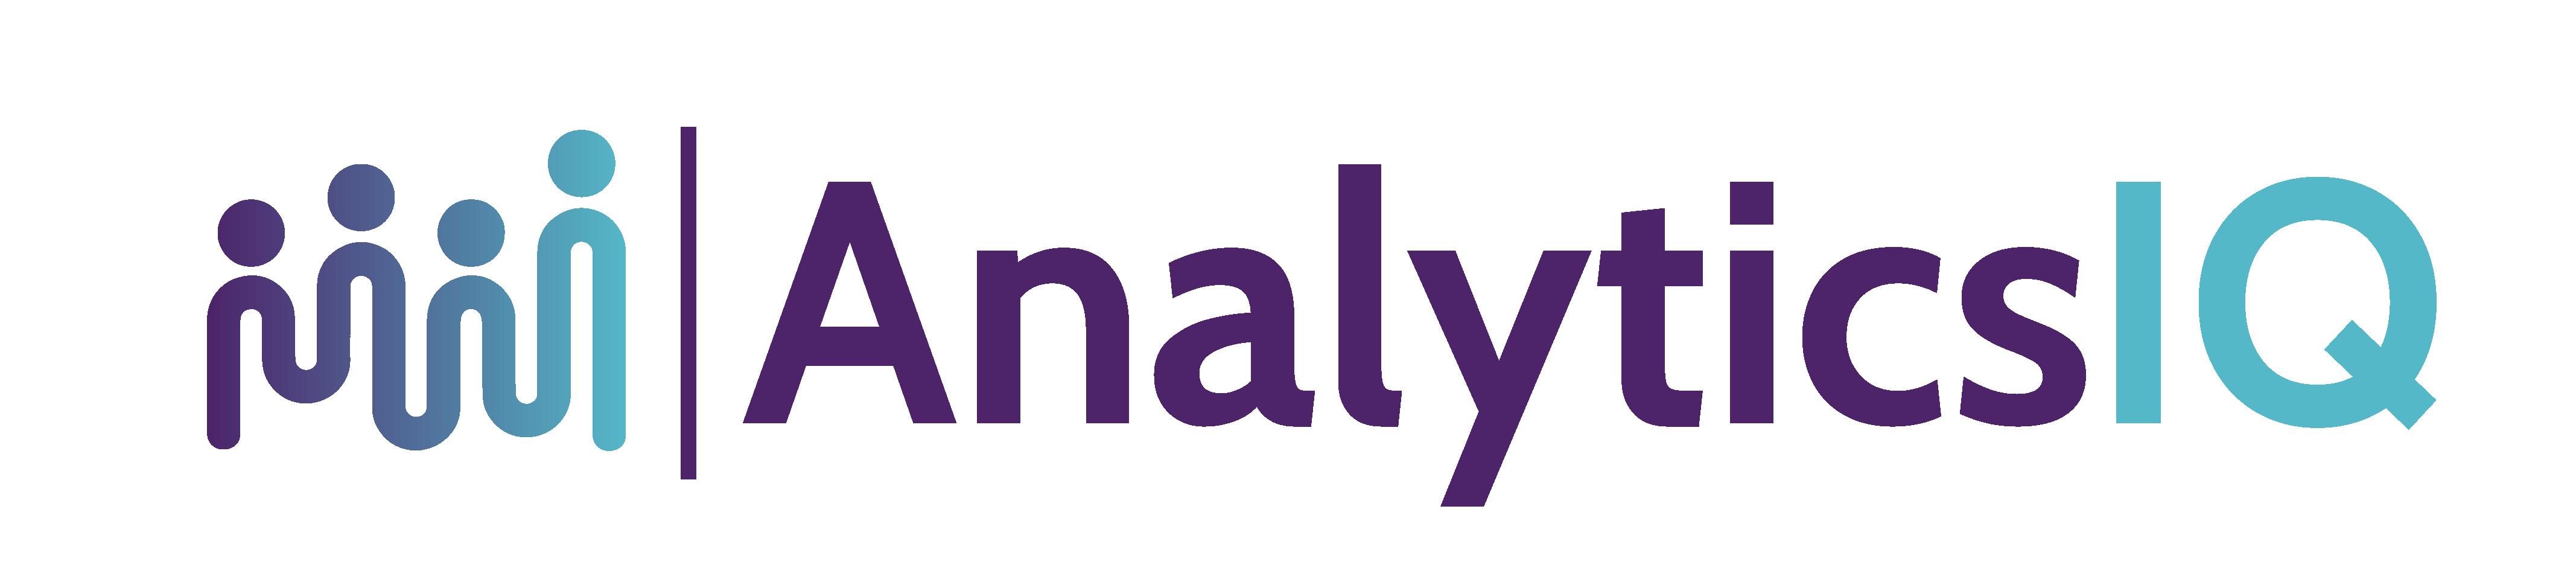 AnalyticsIQ - New Logo